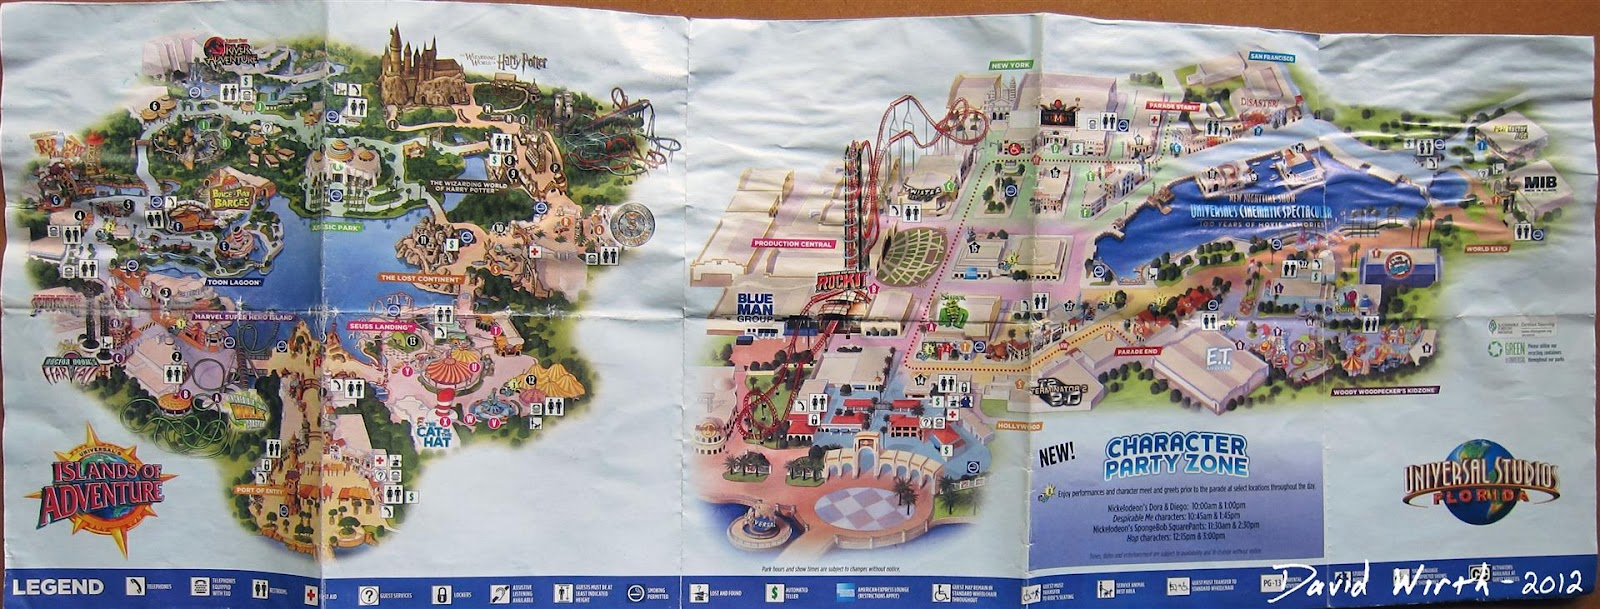 Universal studios islands of adventure map orlando